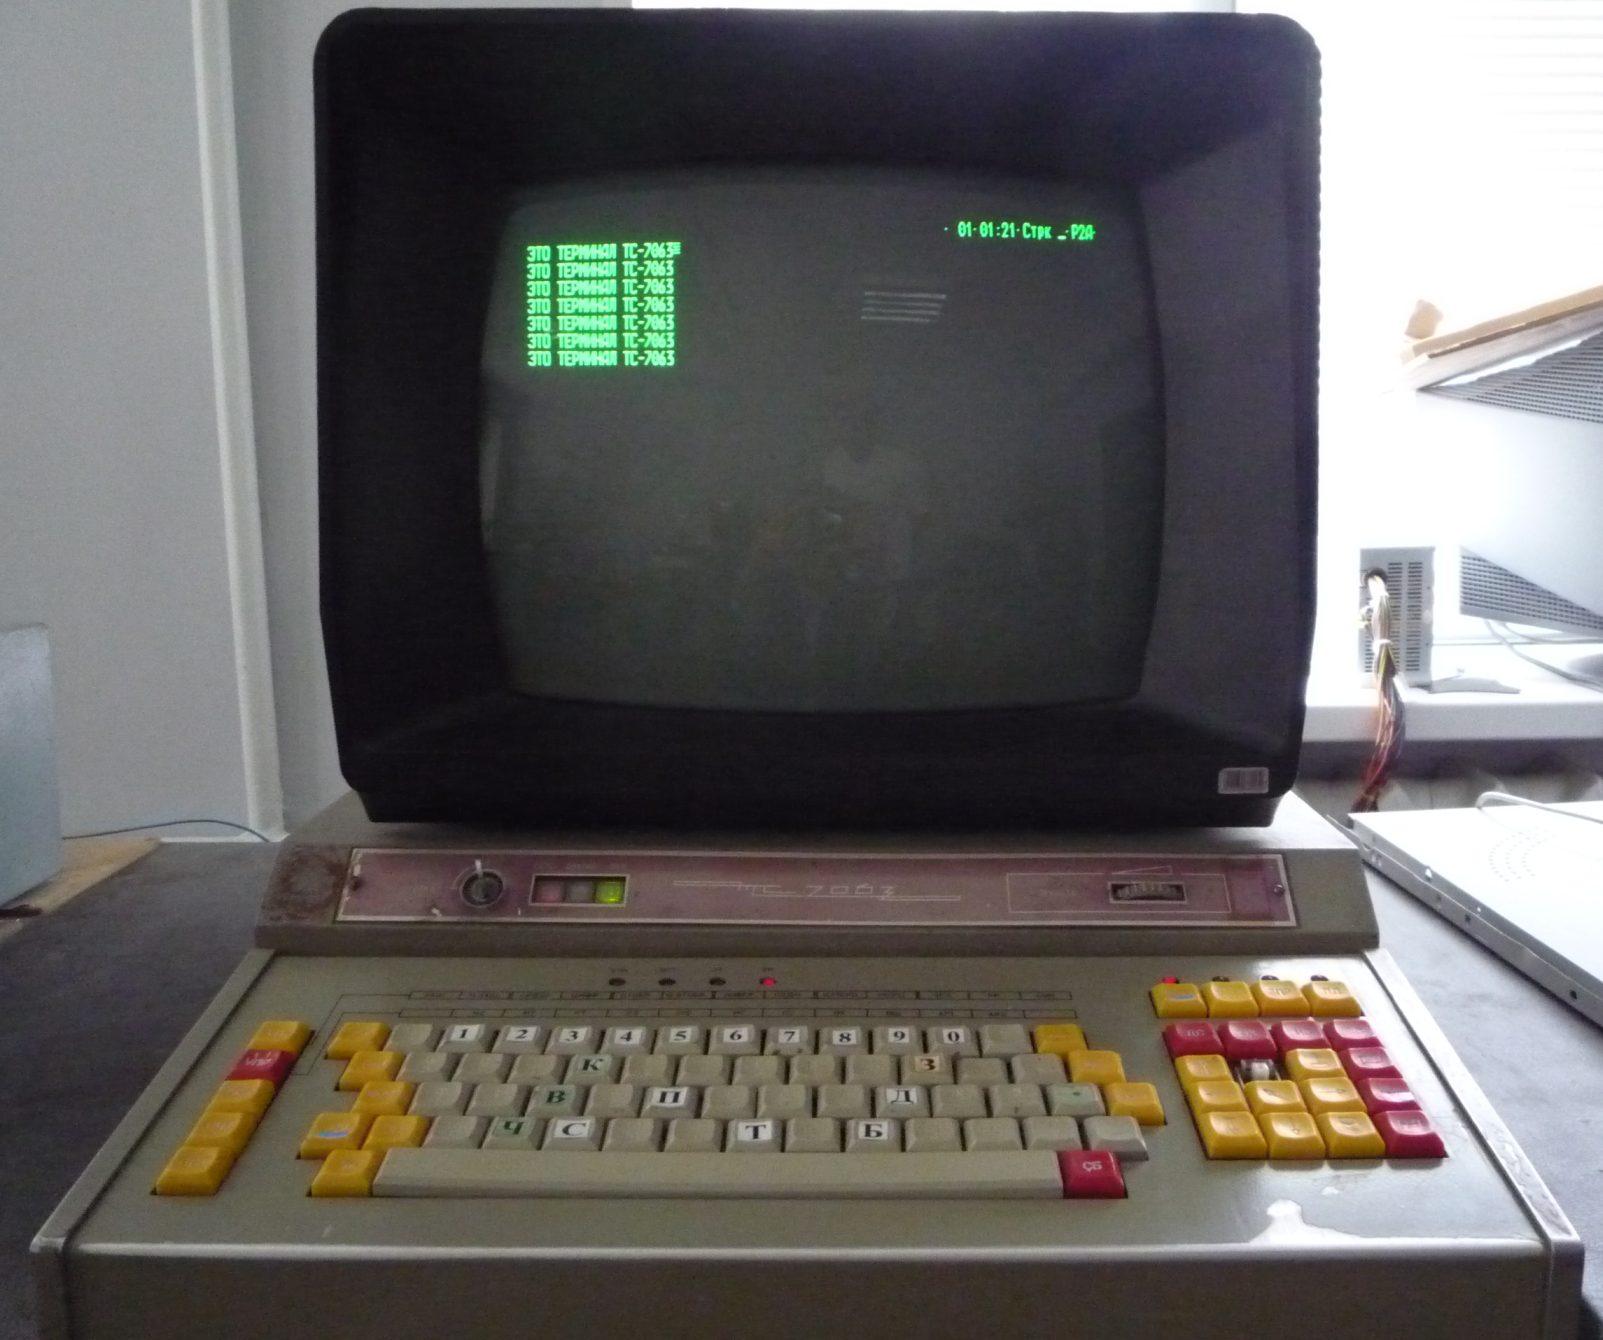 ТС-7063: Вспоминаем 80-е - 1